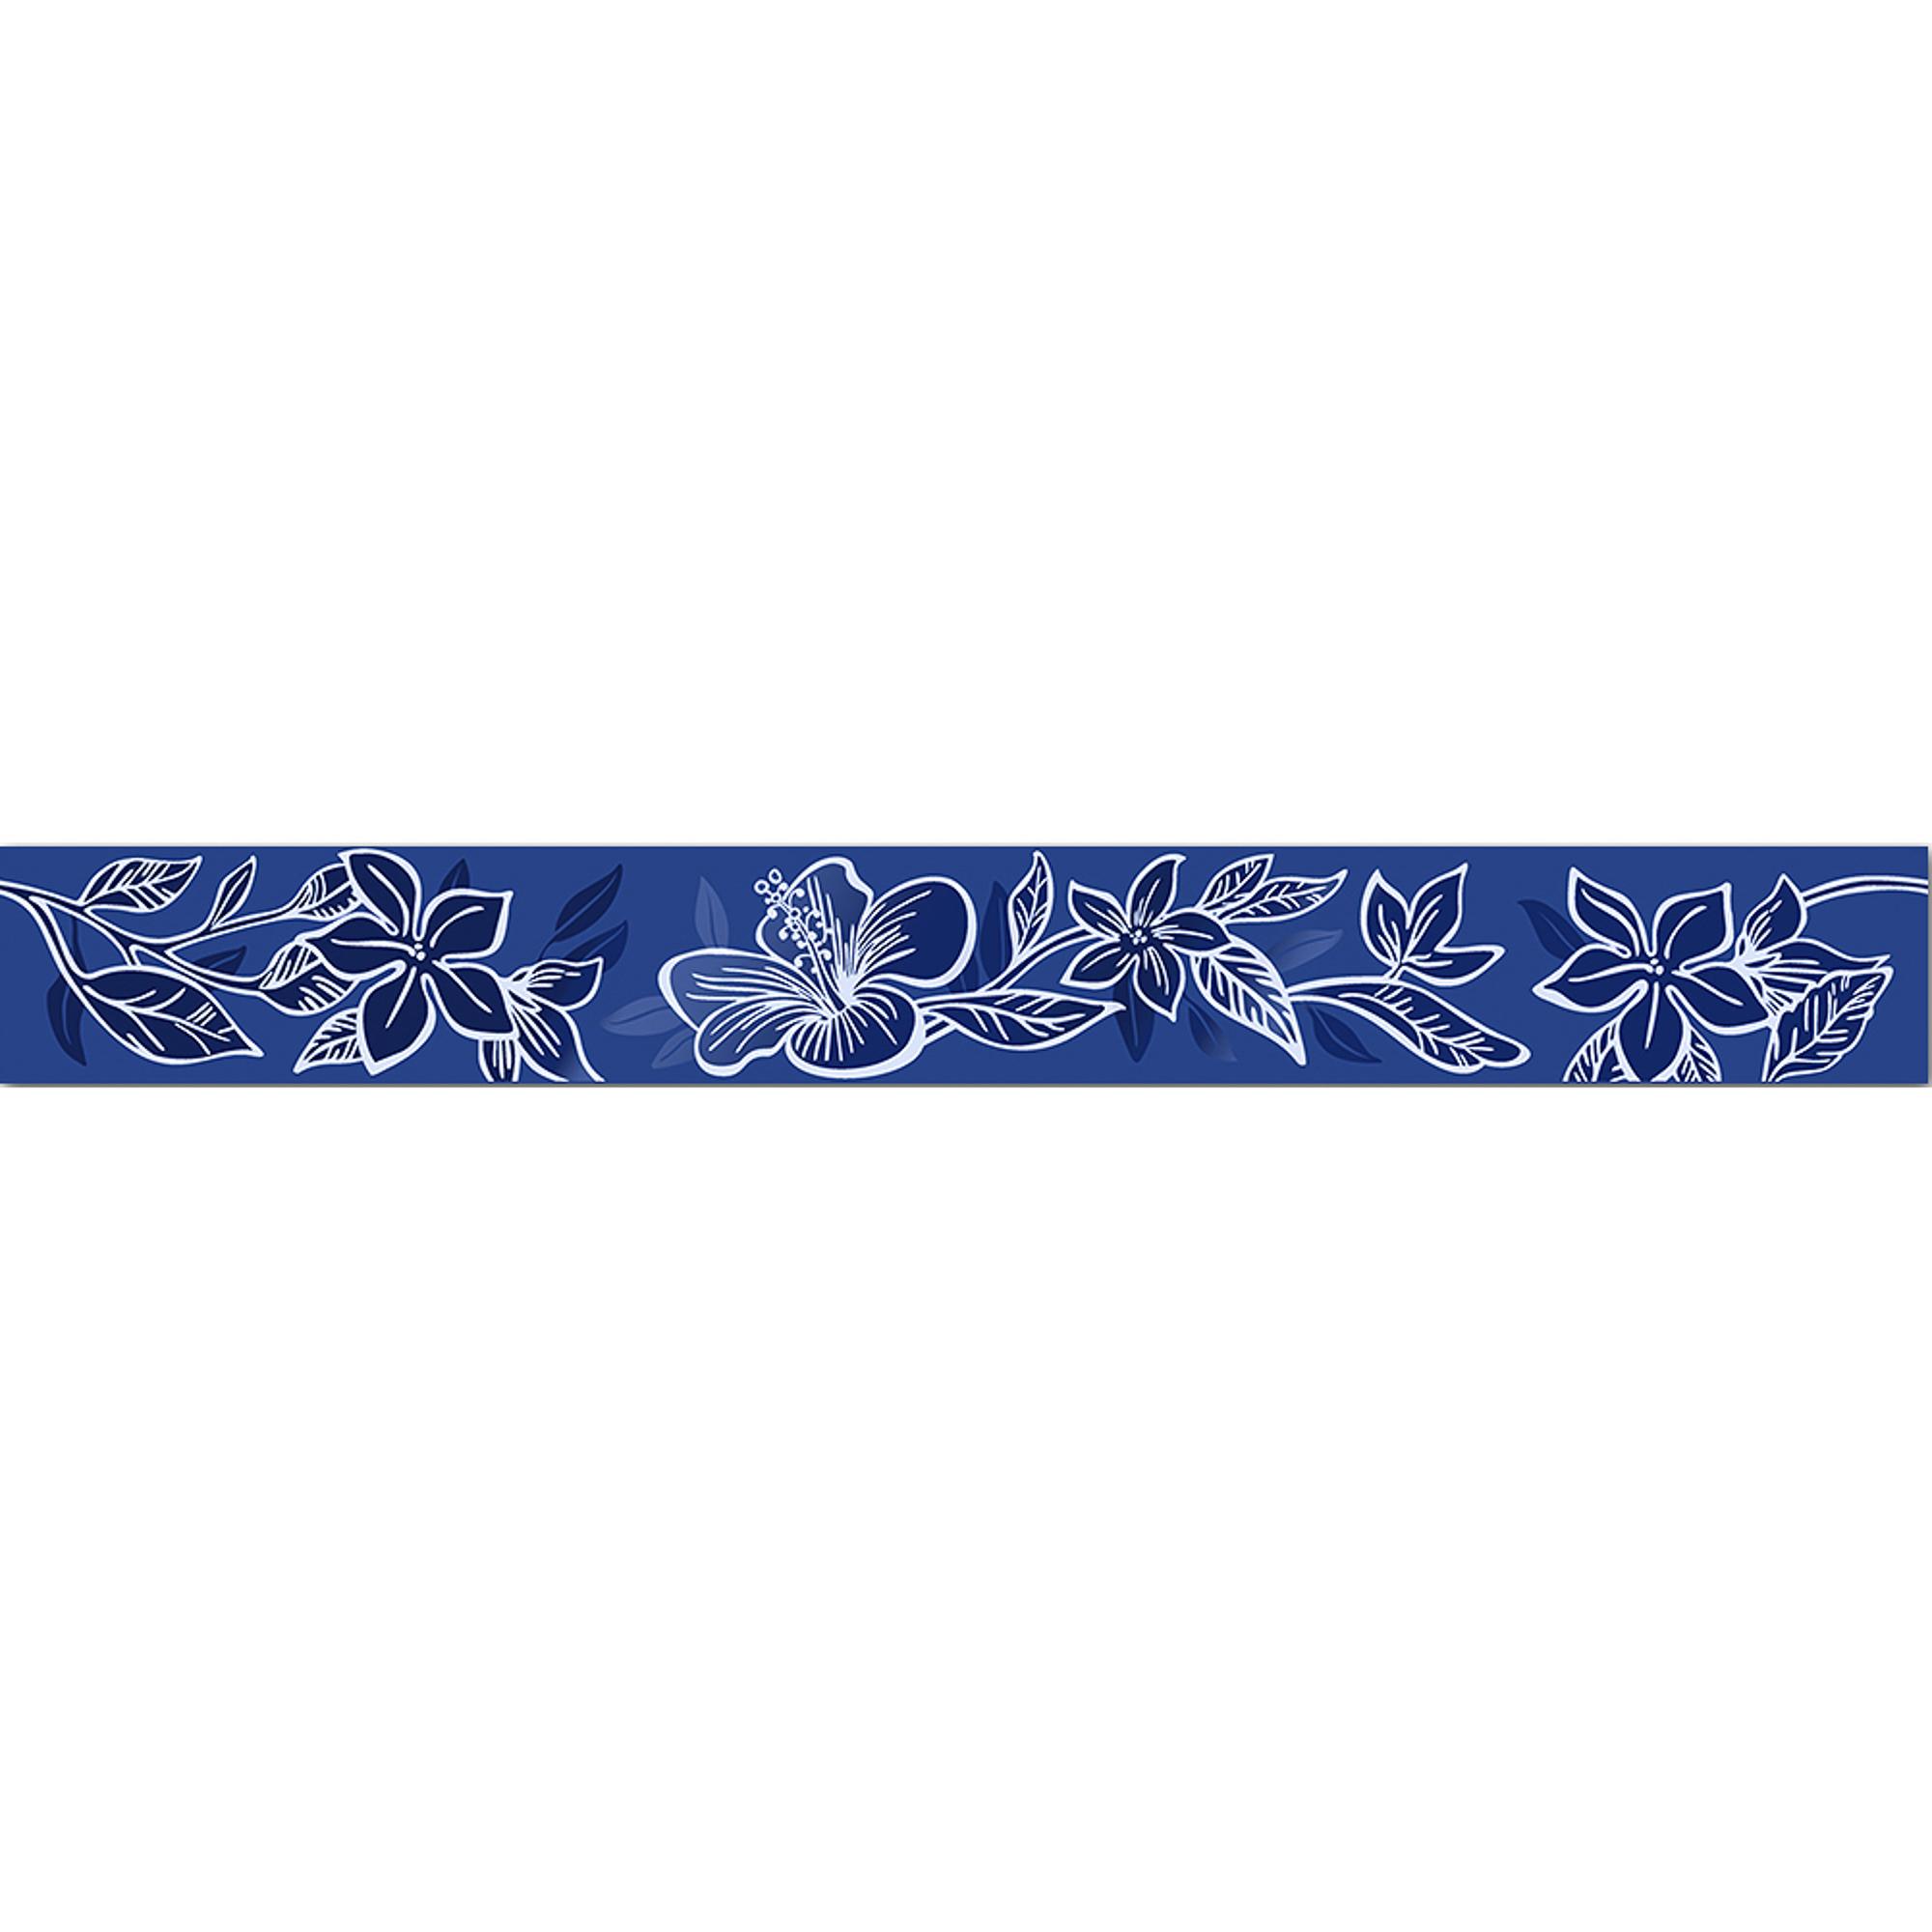 Бордюр Kerlife Elissa Blu Fiore 50,5x6,2 см